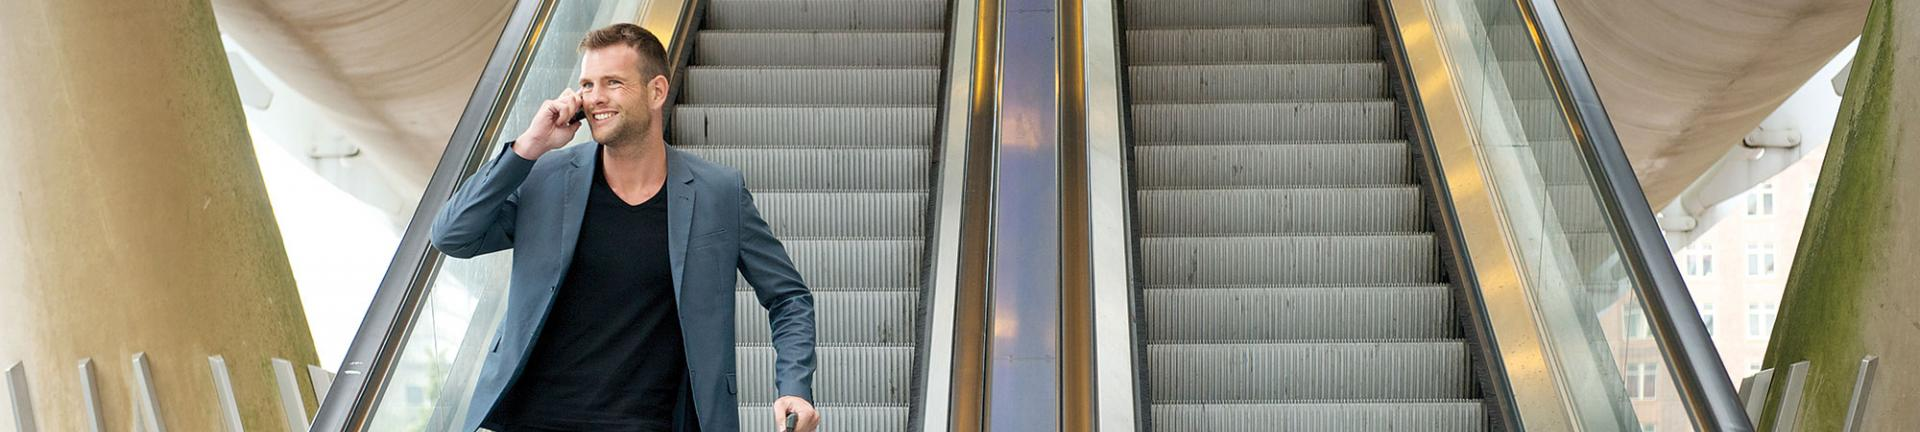 Man on phone standing on escalator